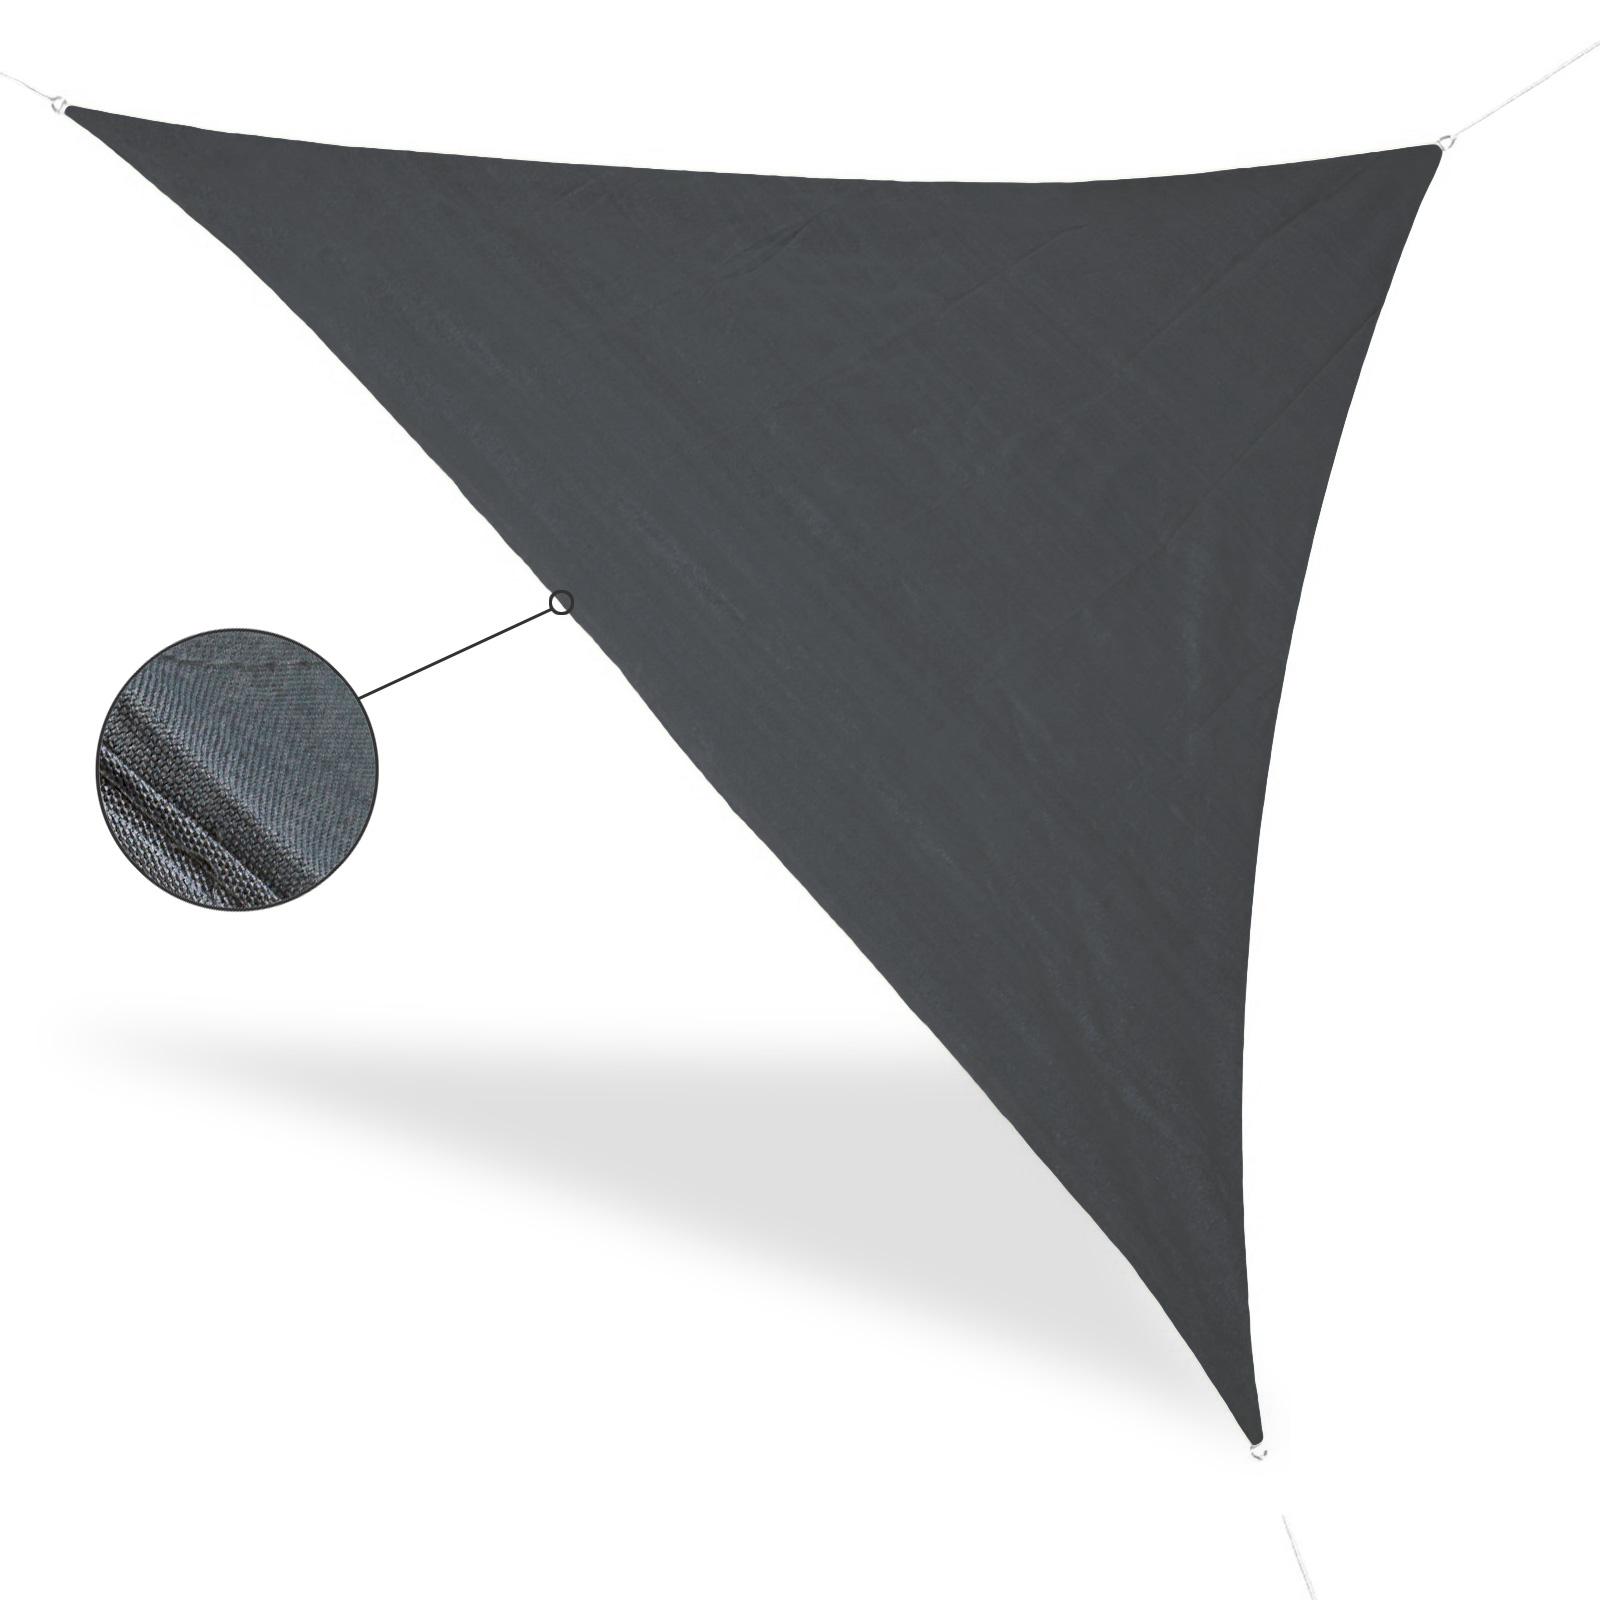 Sonnensegel Dreieck Grau 5 x 5 x 5 m, Metallringe, Abspannleinen